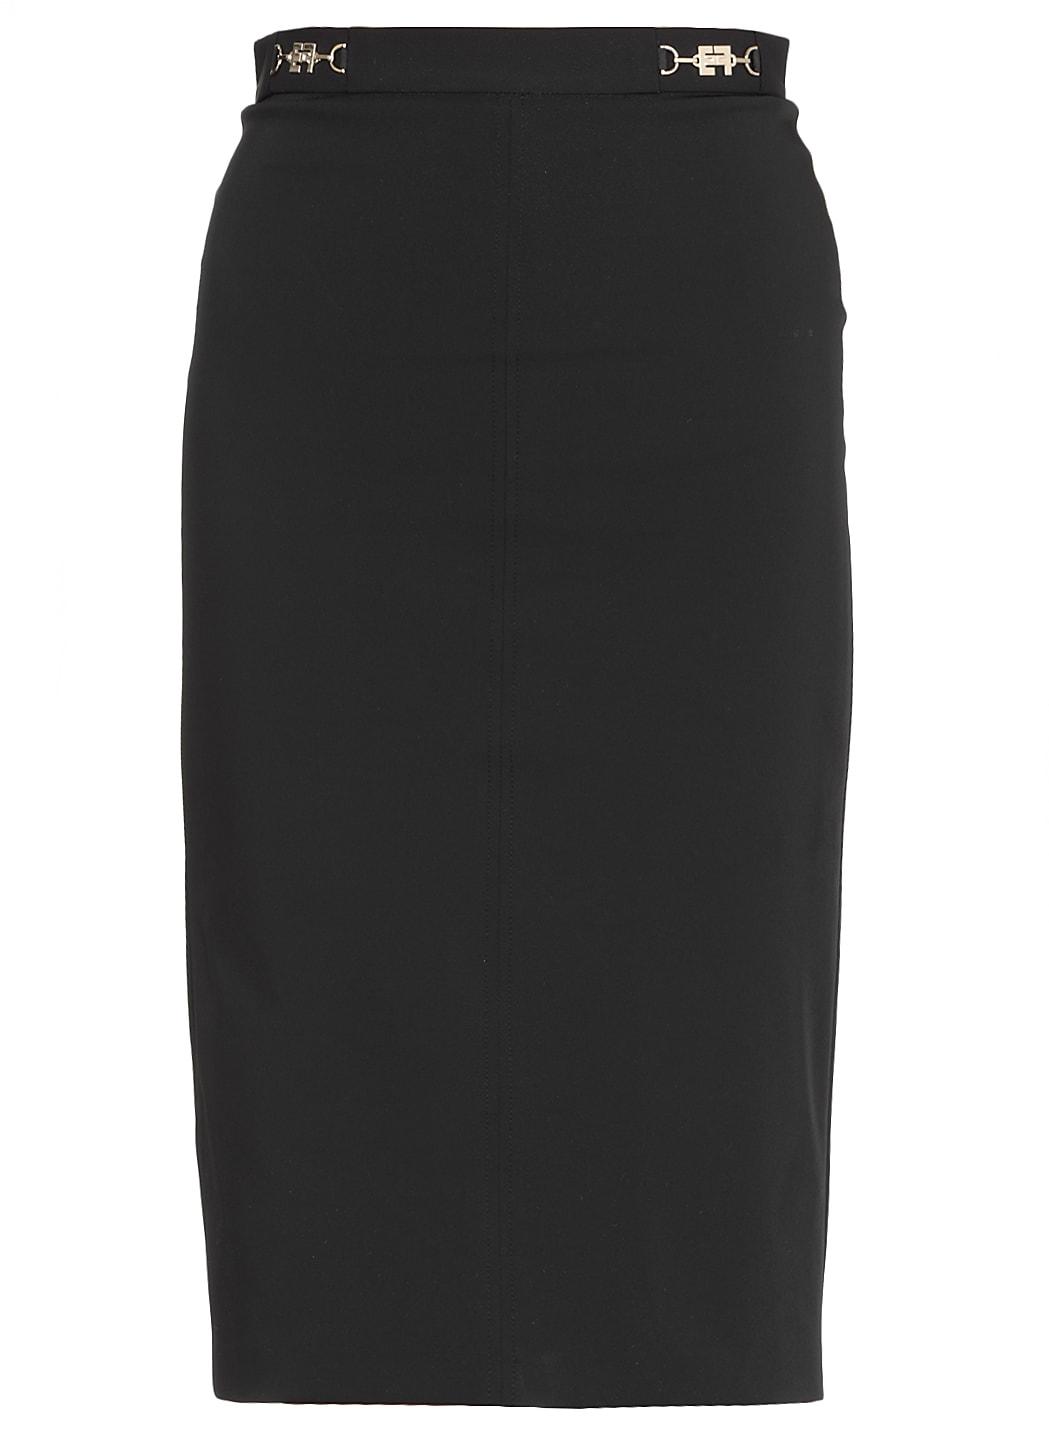 Elisabetta Franchi Fabric Pencil Skirt